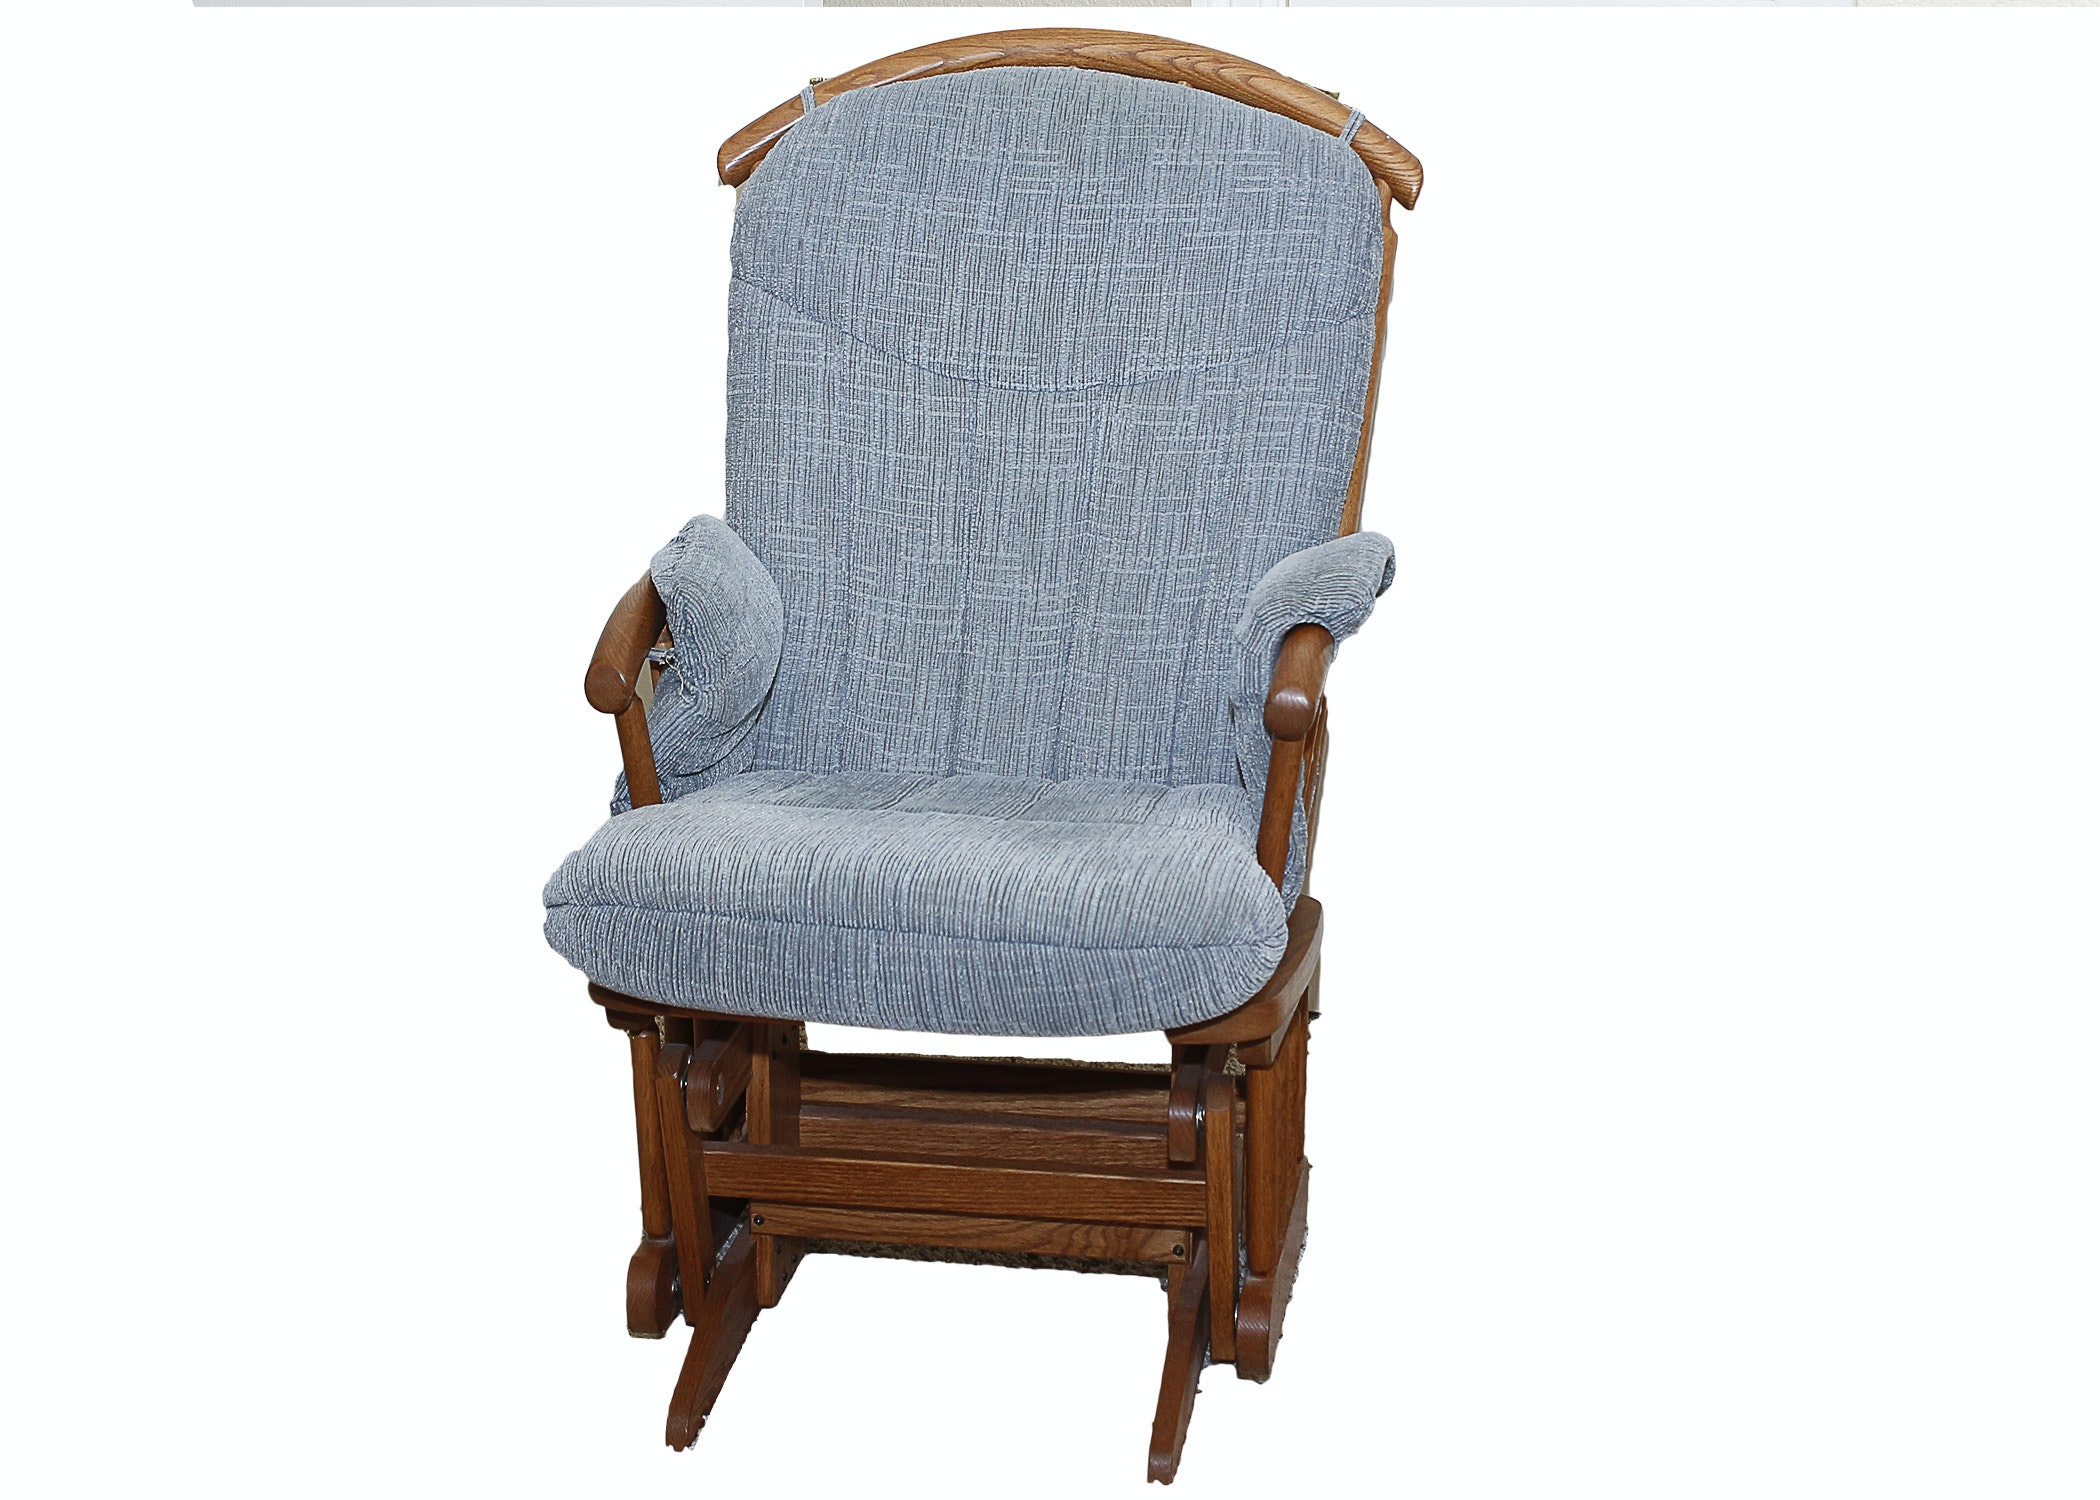 Dutailier Oak Glider with Blue Cushion